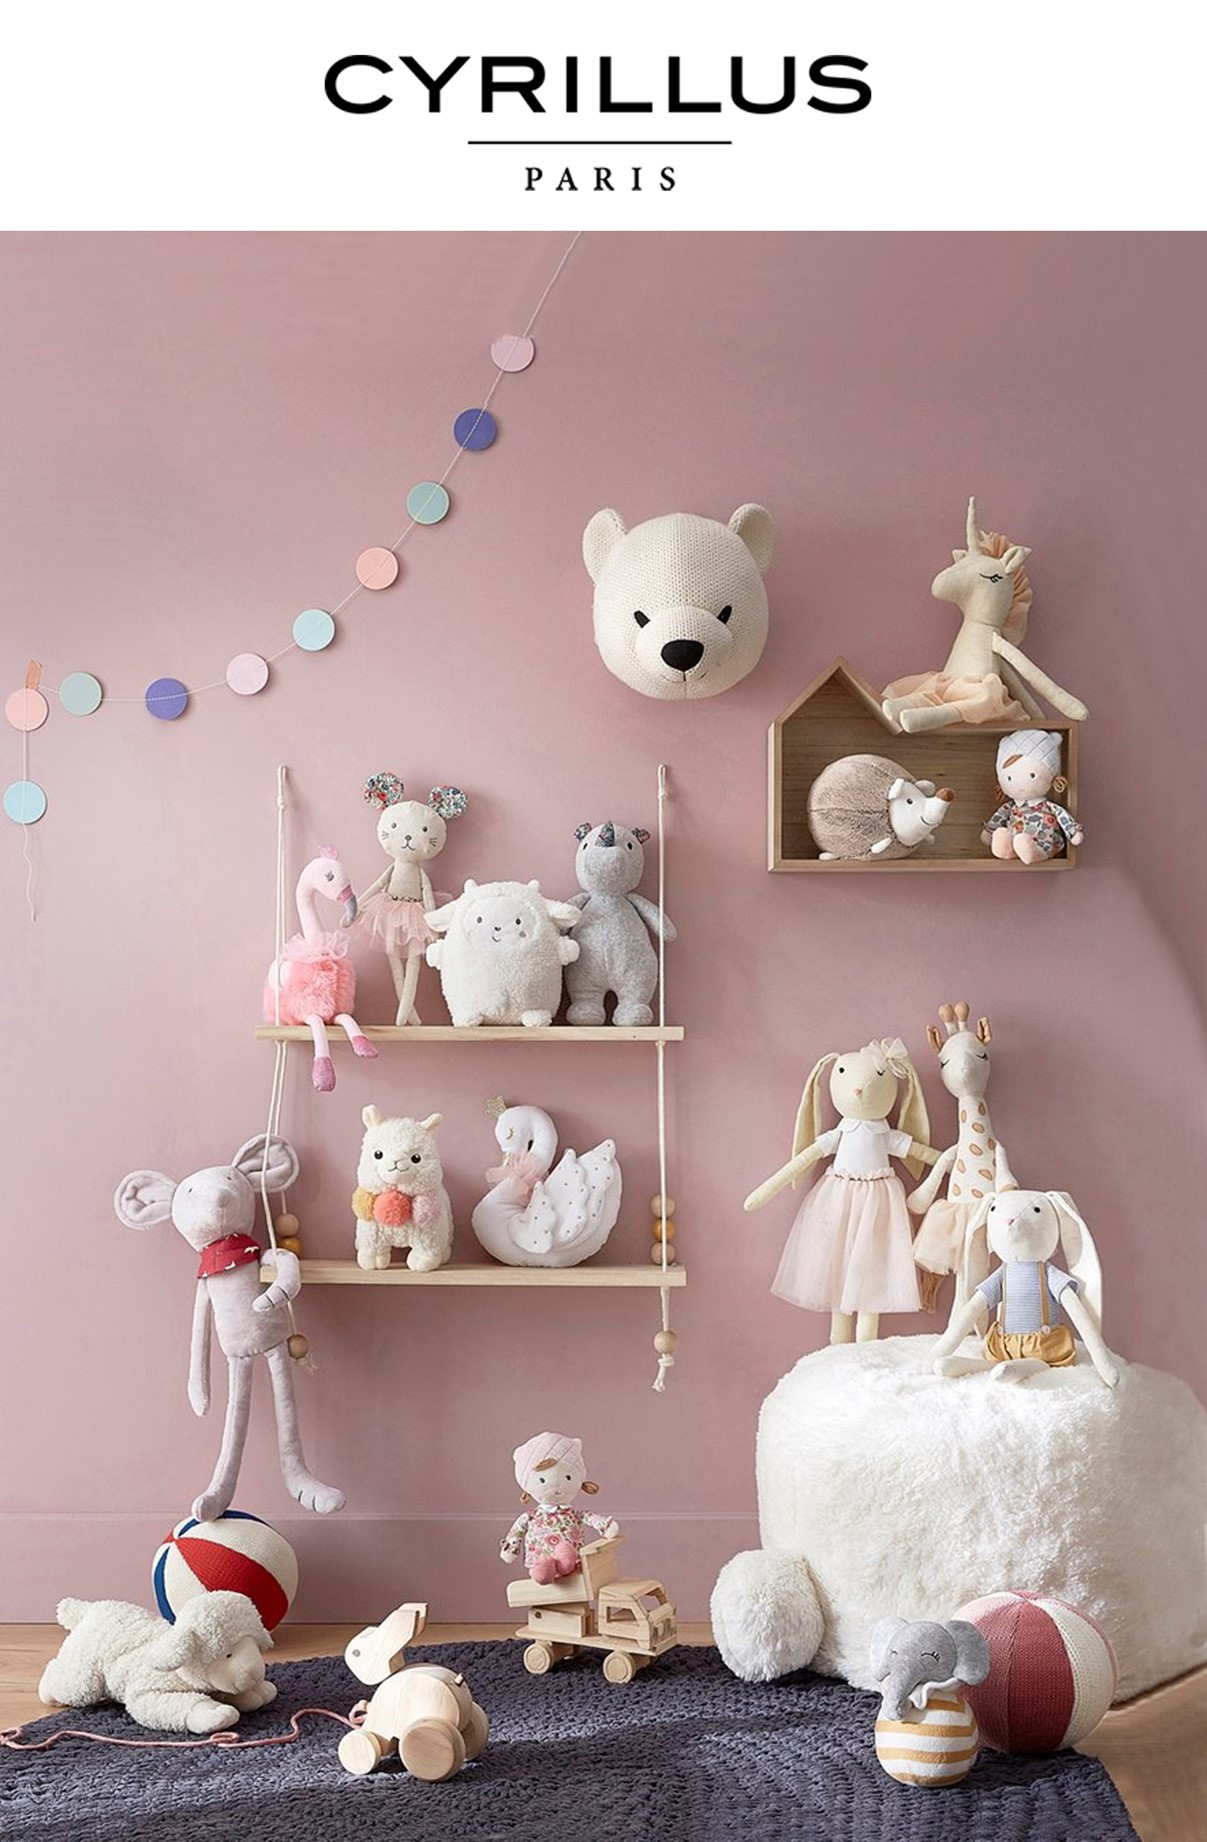 idee-boutique-bebe-mignonne-cyrillus